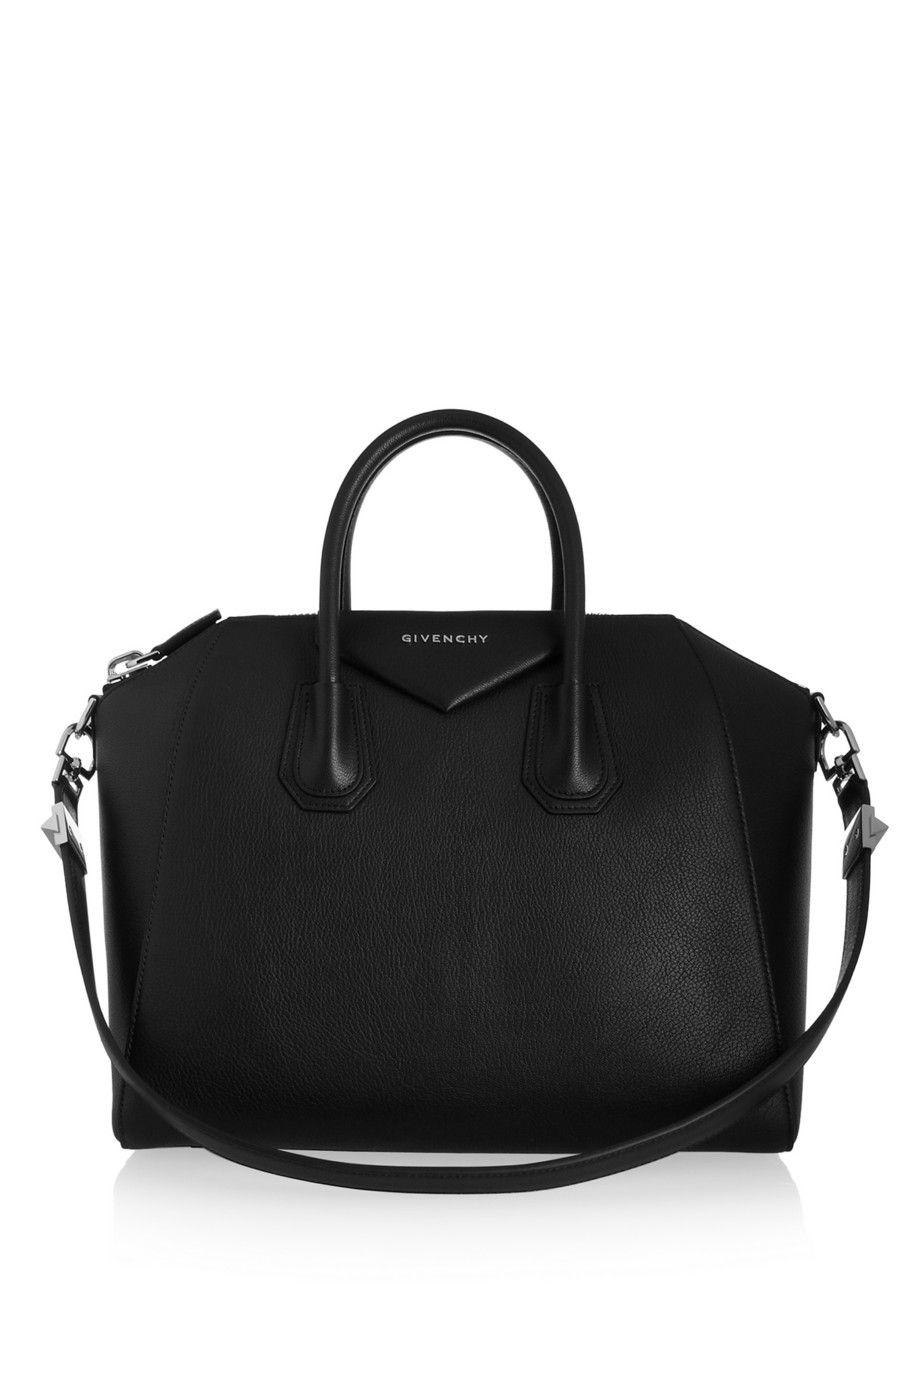 givenchy medium antigona bag in black leather givenchy. Black Bedroom Furniture Sets. Home Design Ideas